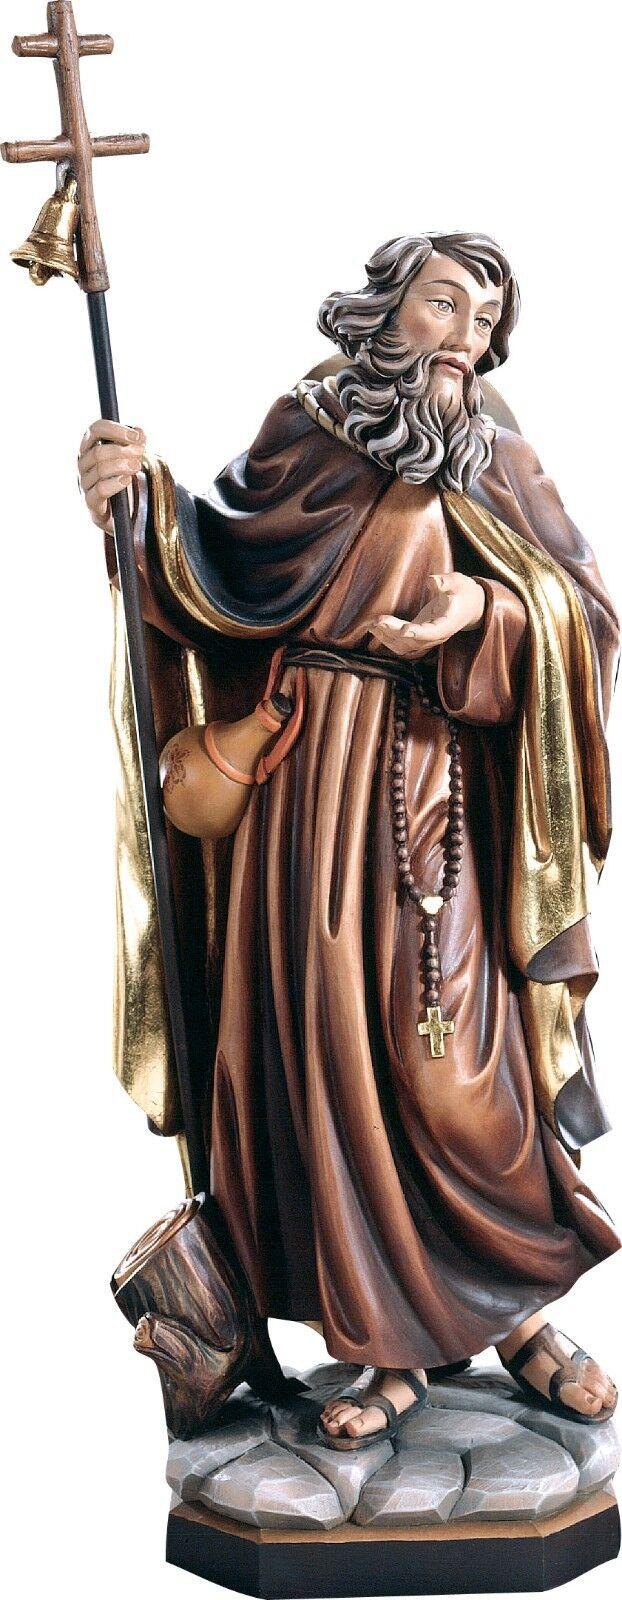 Statue SAN lutpold lutpold lutpold Hl lutpold wooden Statuen | Optimaler Preis  a8f1b6